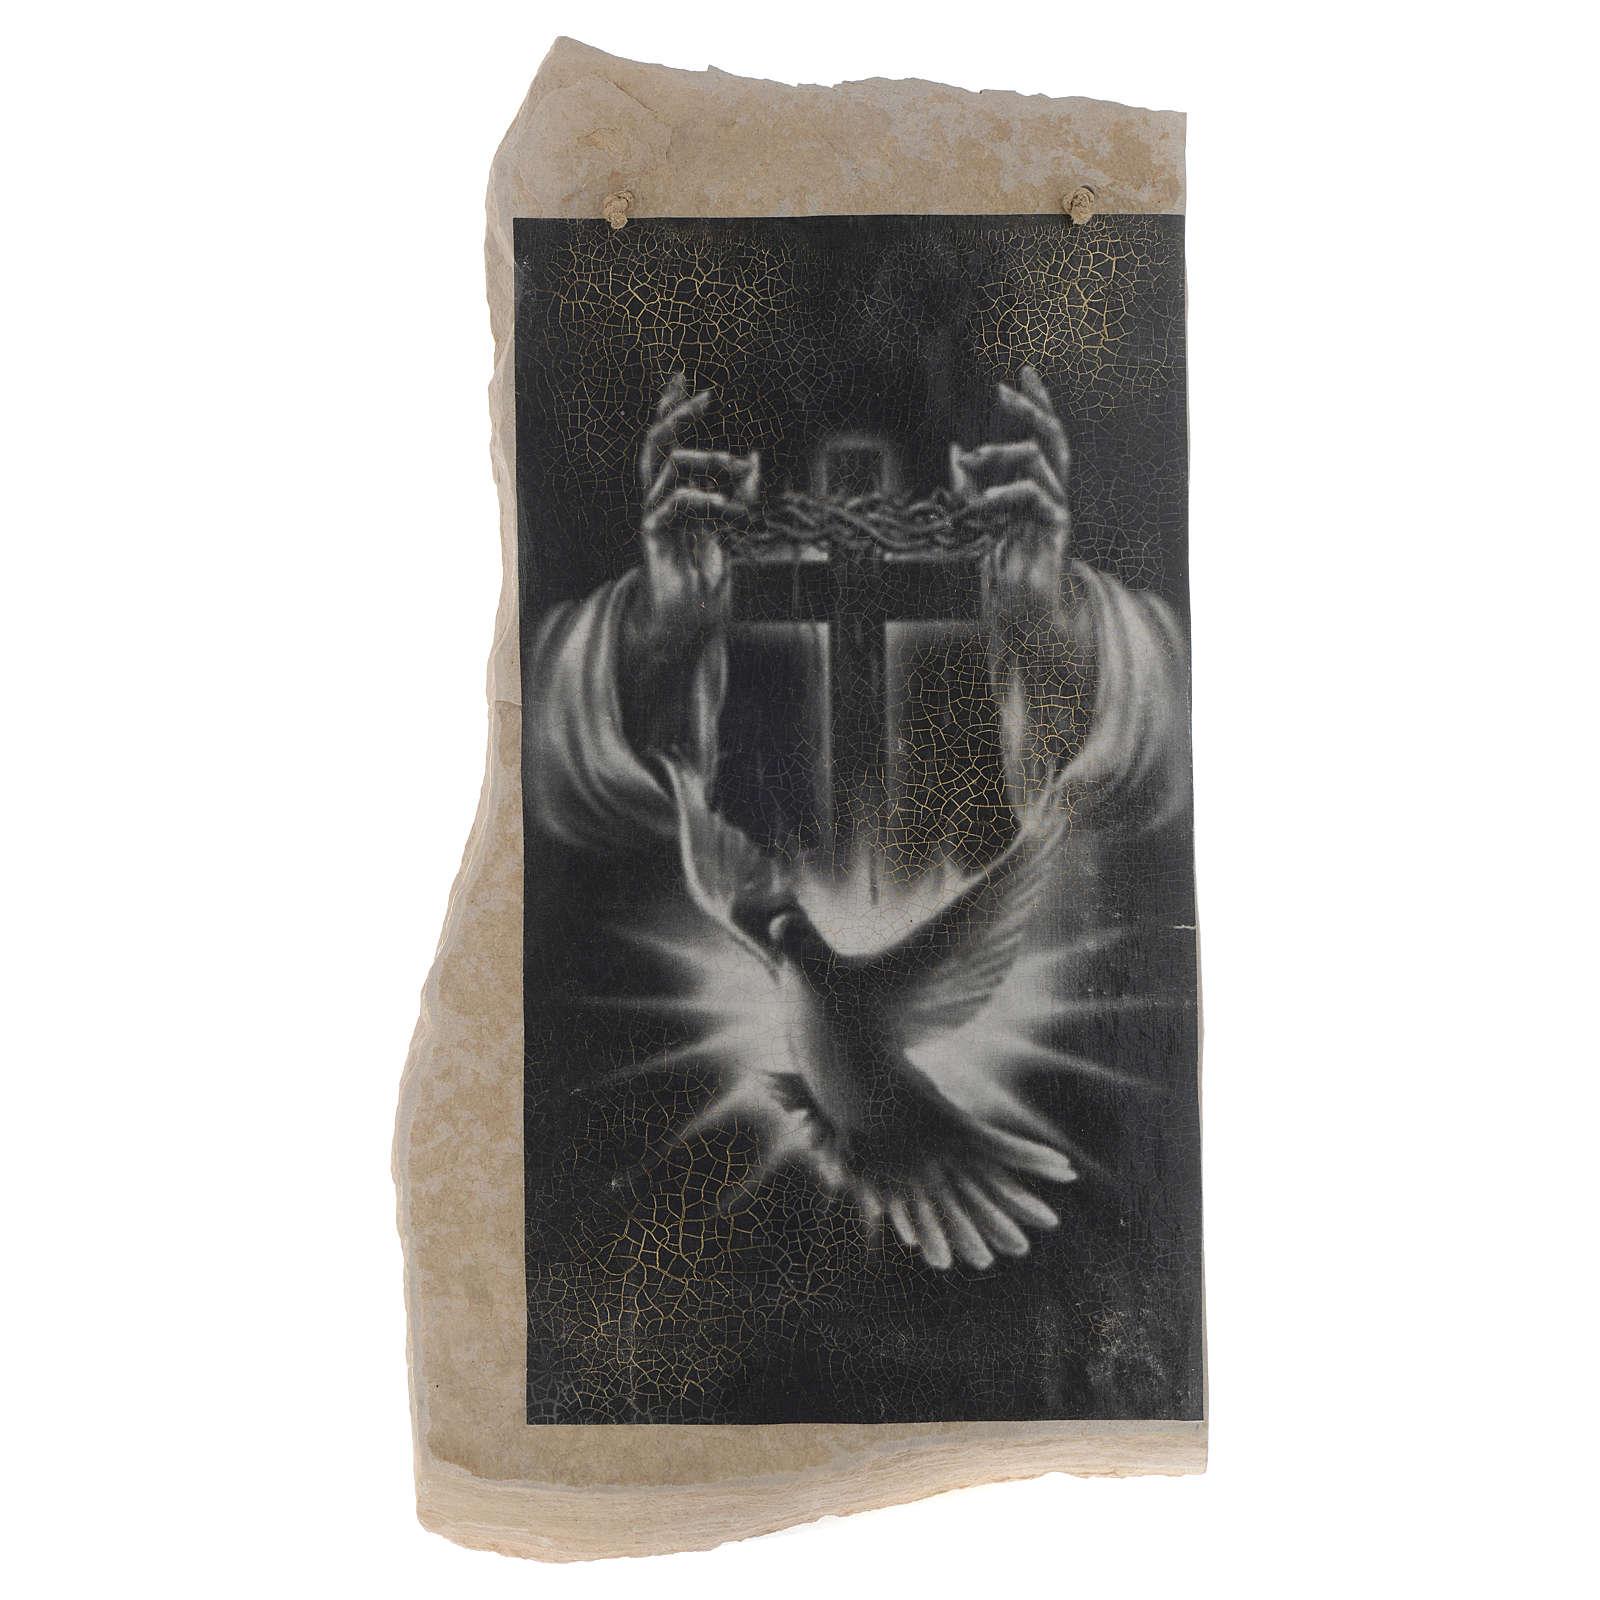 Cuadro cruz negra blanca Espíritu Santo de piedra de Medjugorje 4